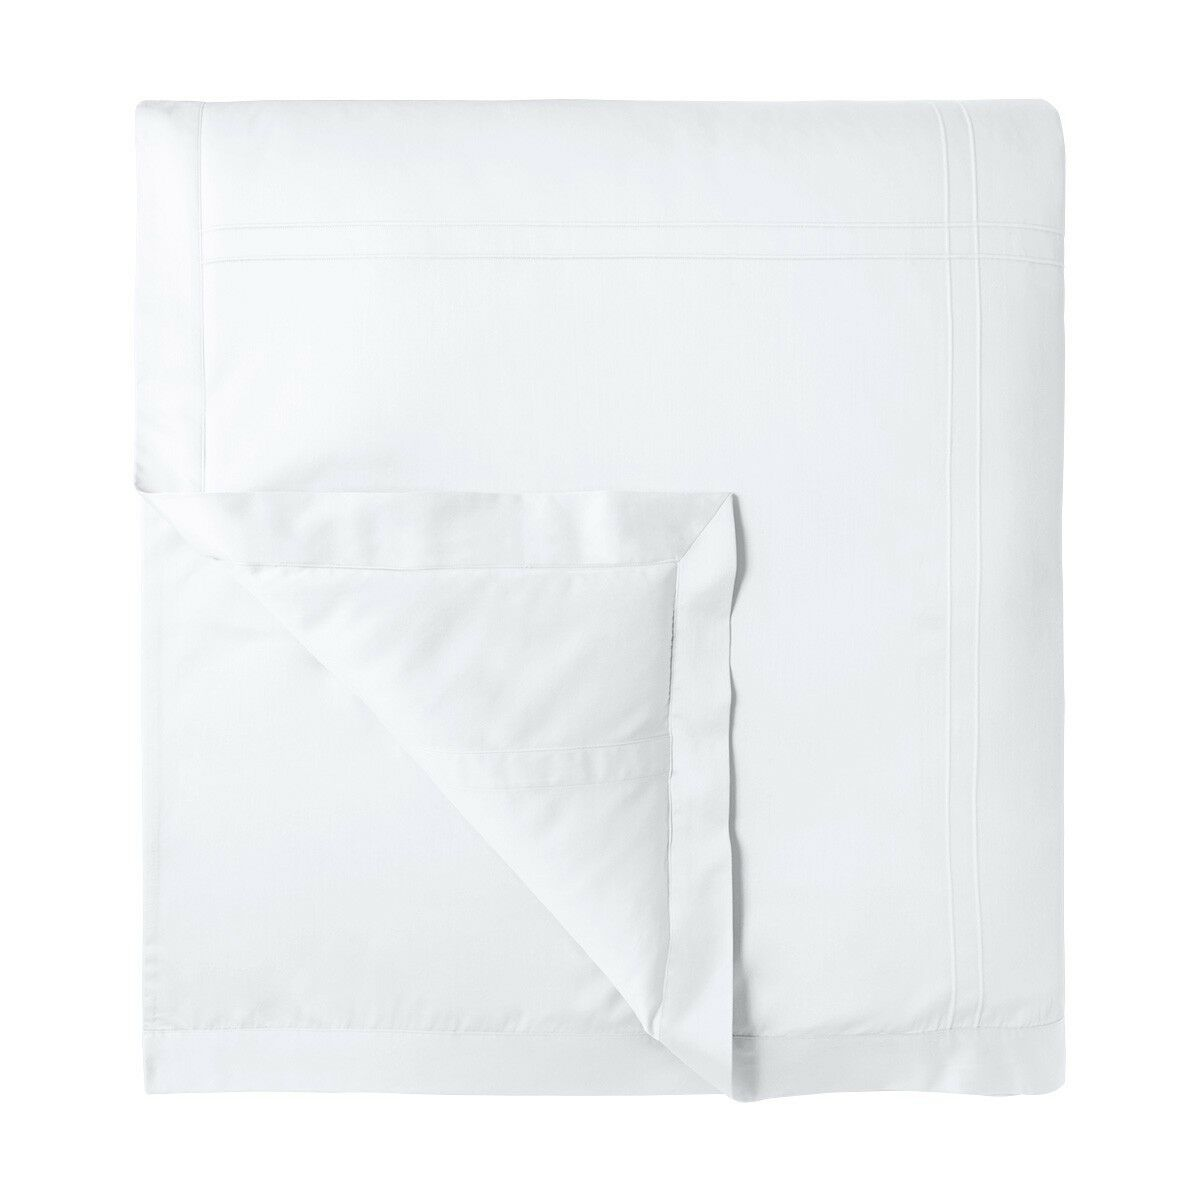 Yves Delorme Adagio Queen Duvet Cover - Weiß